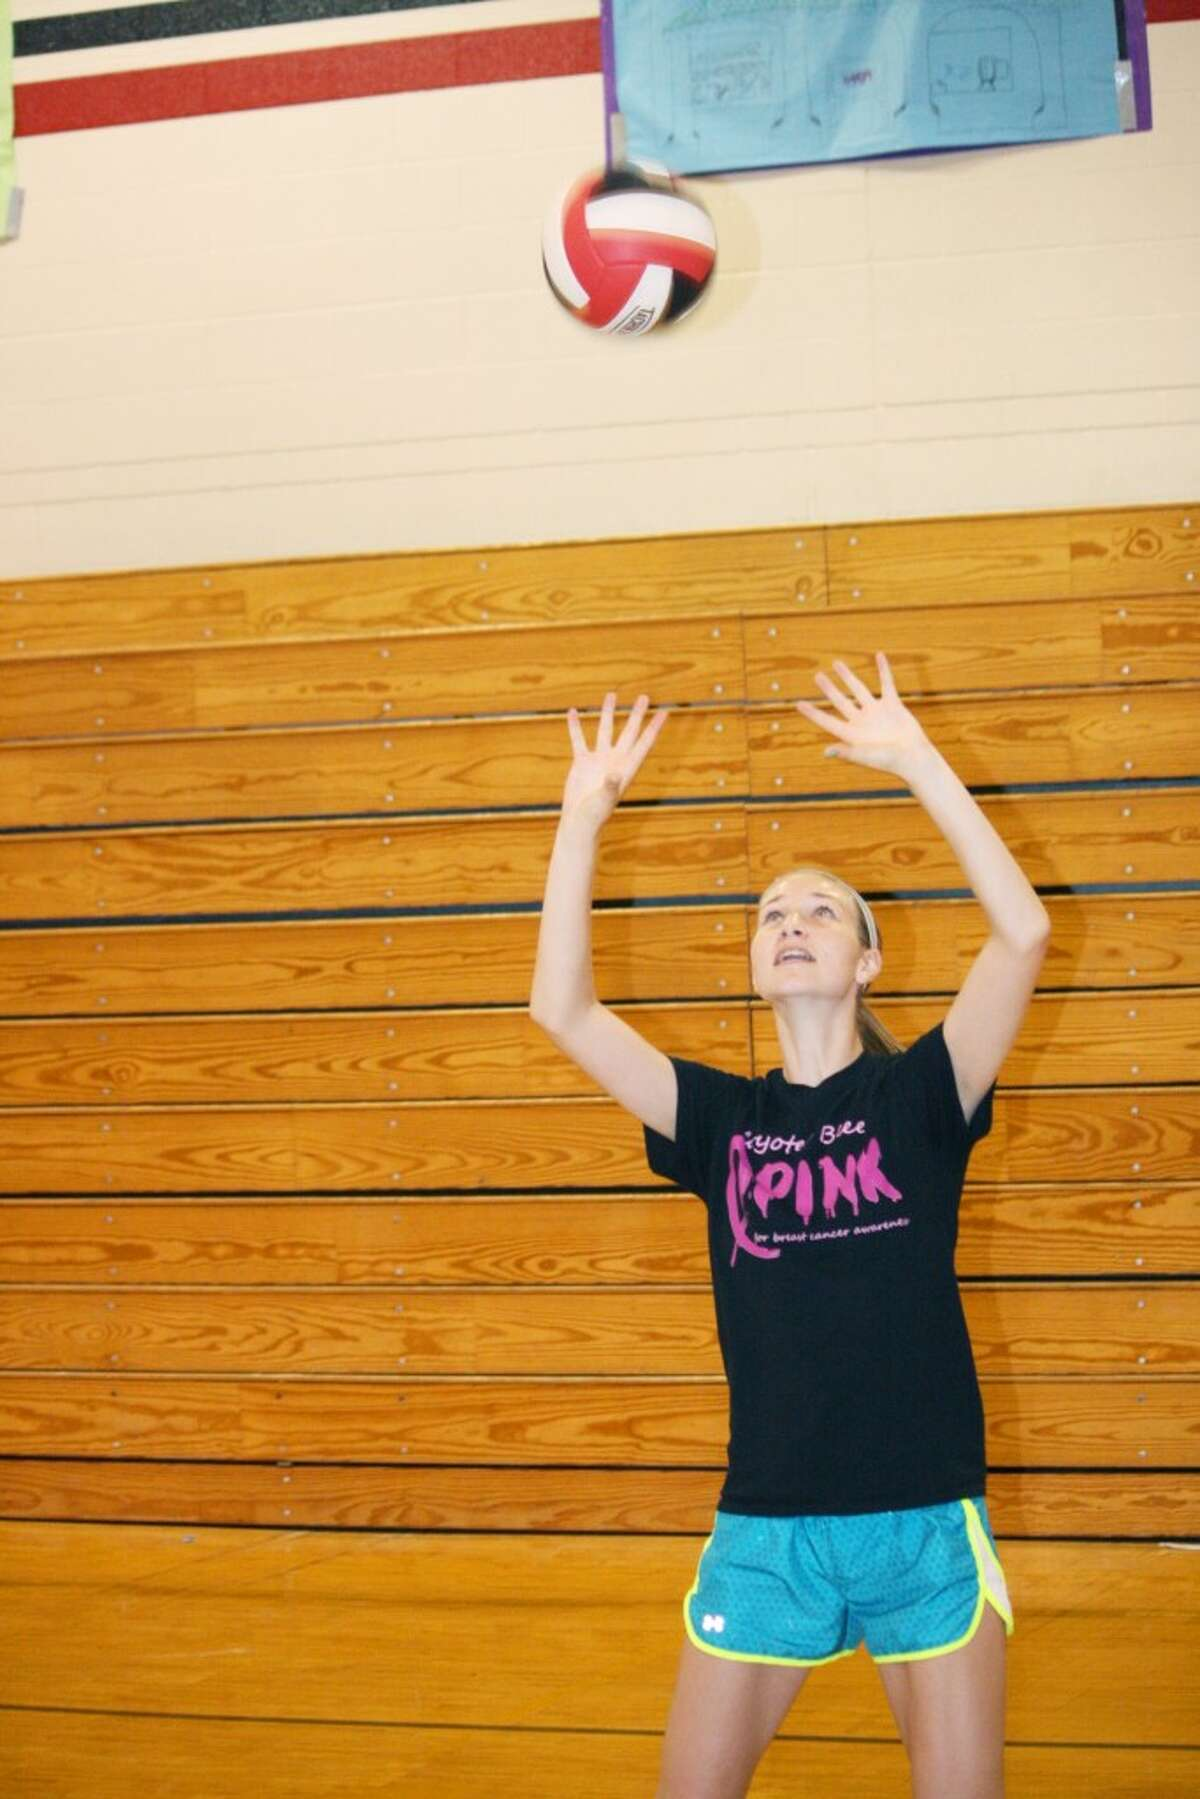 Volleyball: Alison Schermerhorn sets the ball during a Reed City volleyball practice. (Herald Review/John Raffel)